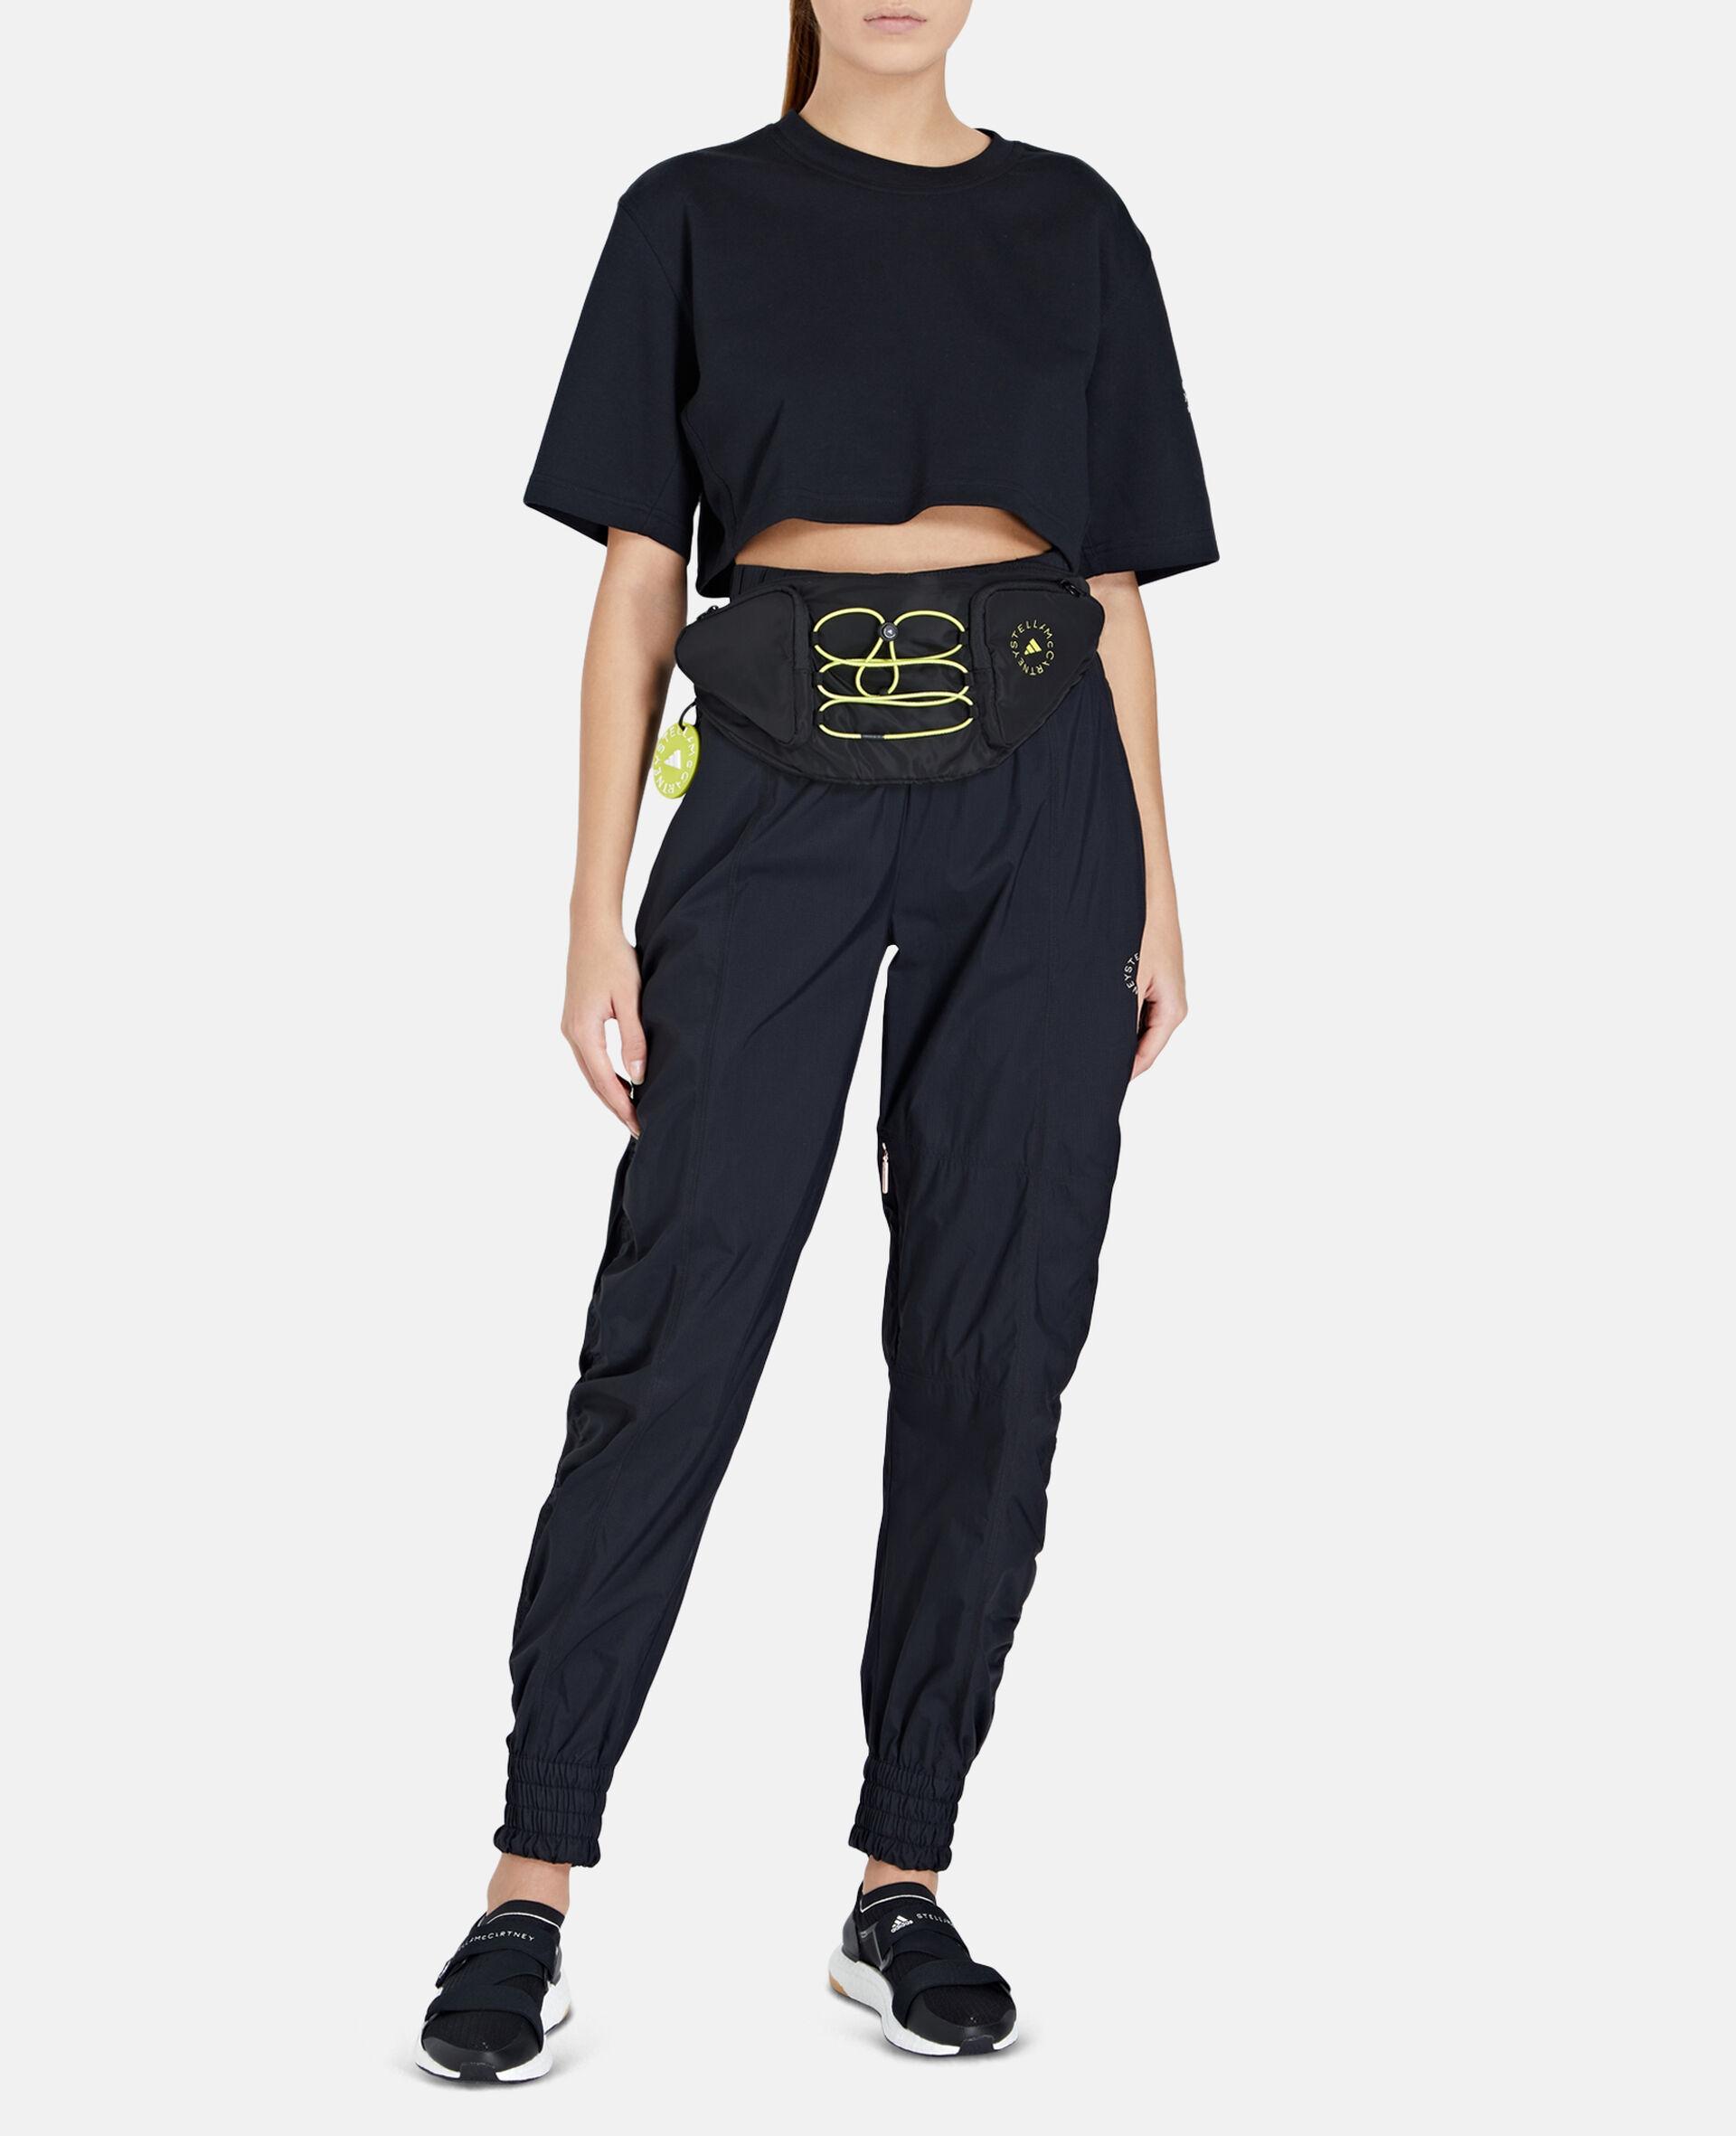 Black Running Bum Bag-Black-large image number 2